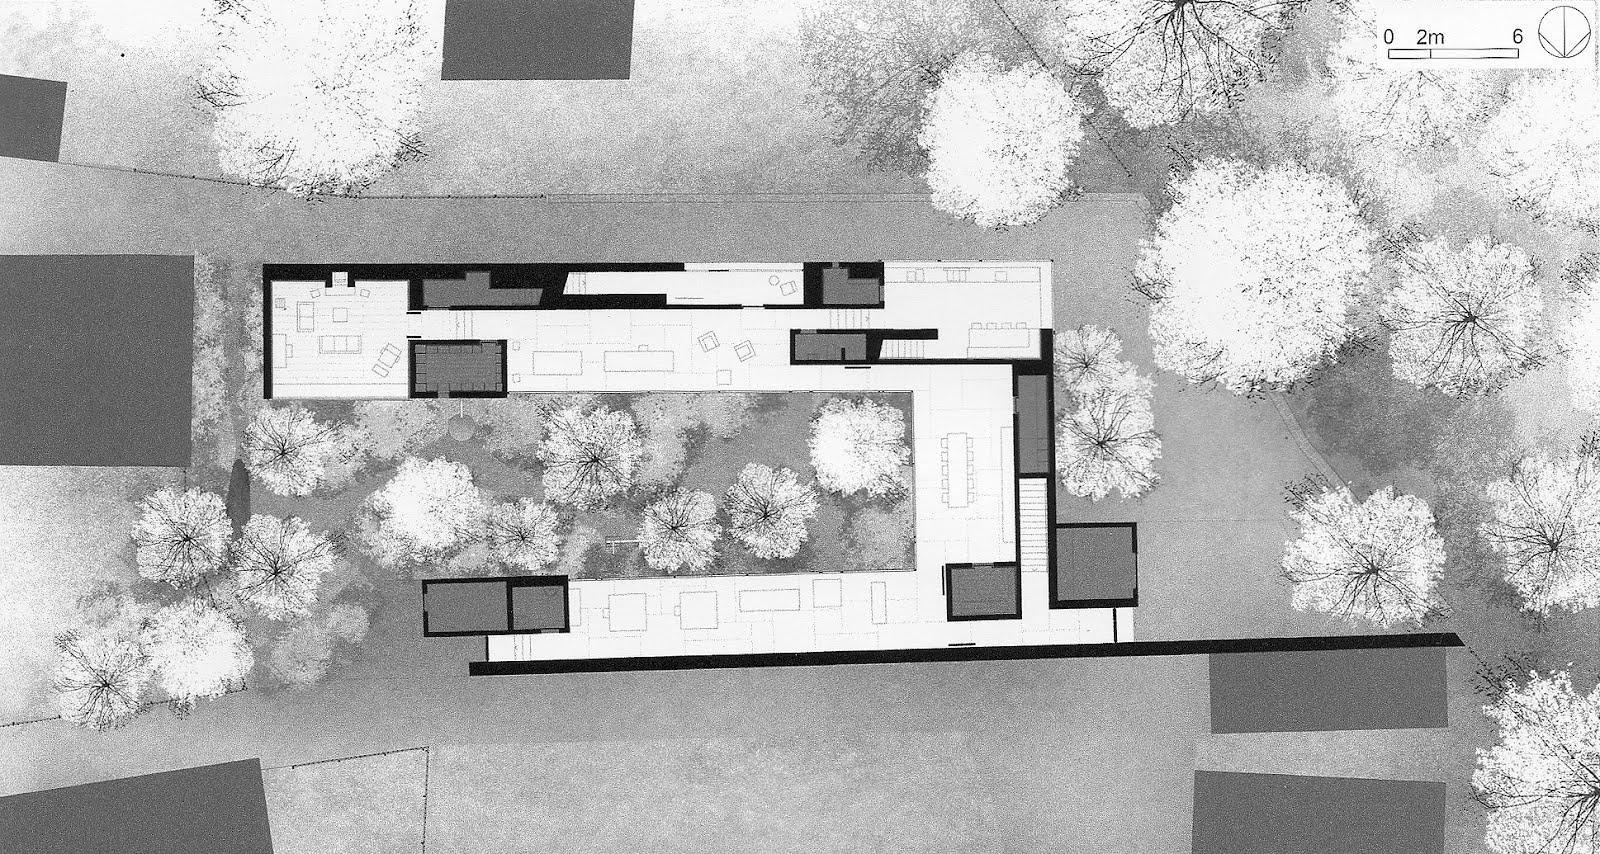 05 haus zumthor 1 600 854 pixels arch drawing for Plan estudios arquitectura